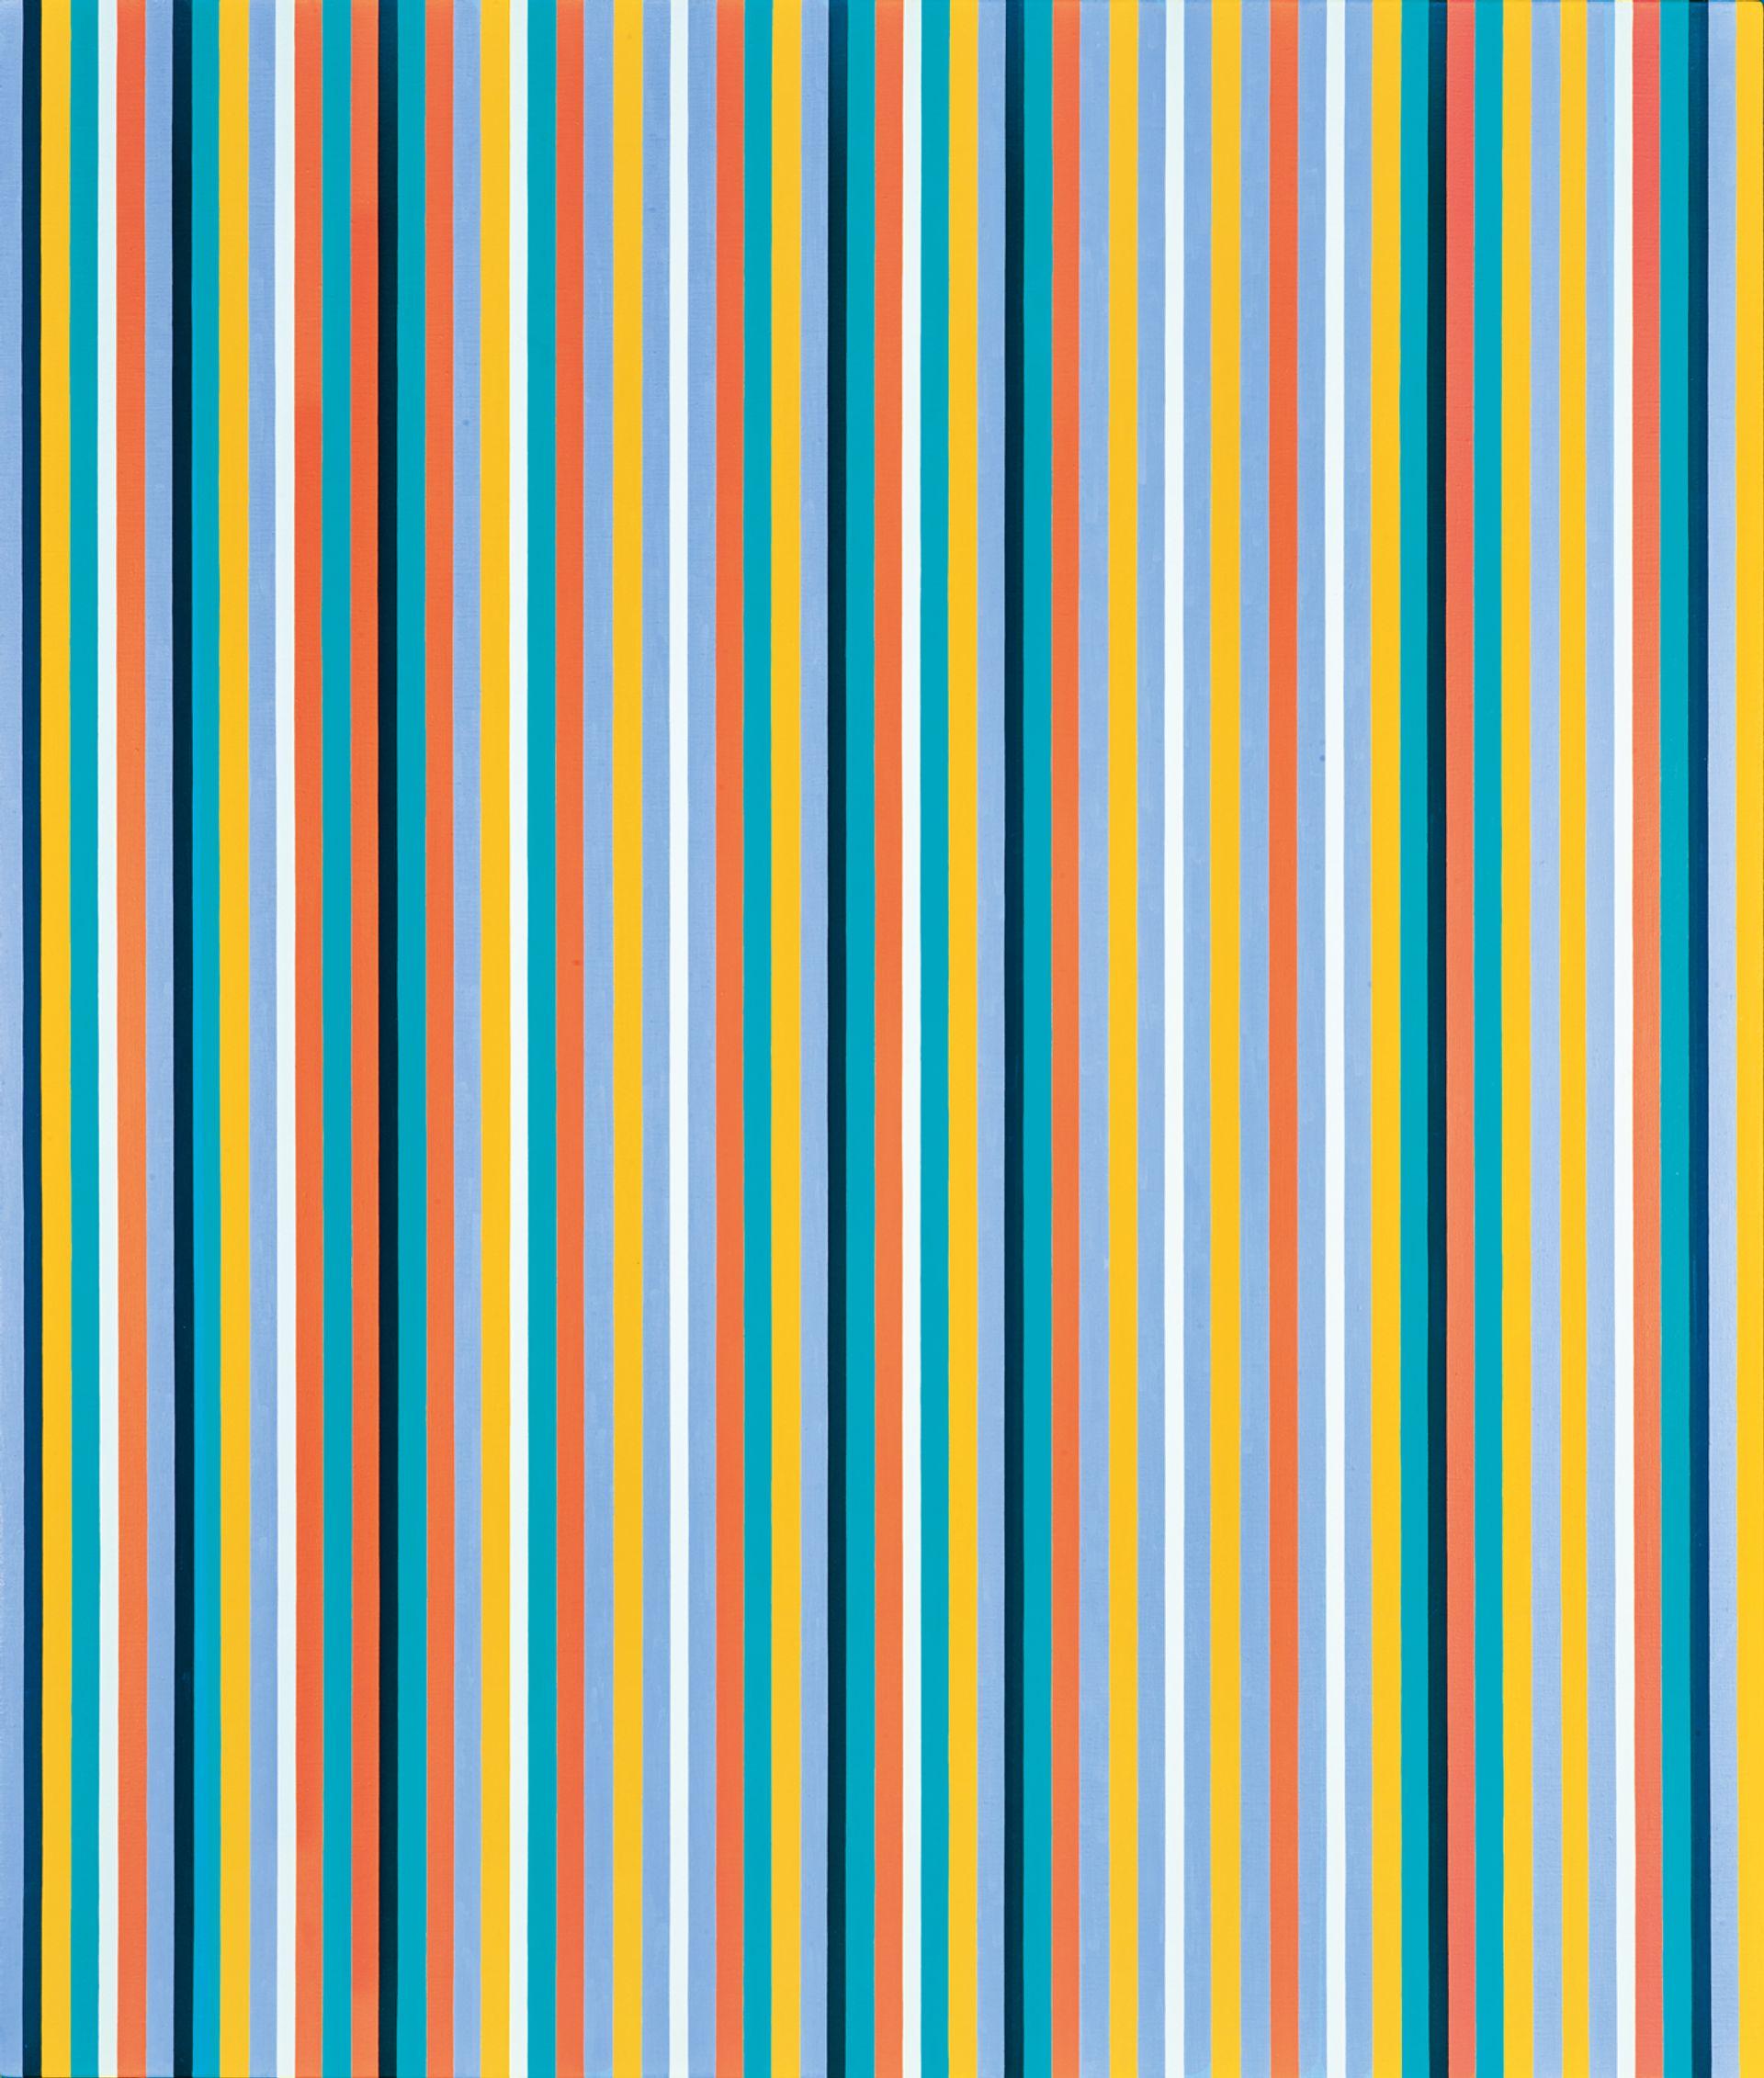 Bridget Riley, Cool Edge (1982) Image courtesy of Sotheby's